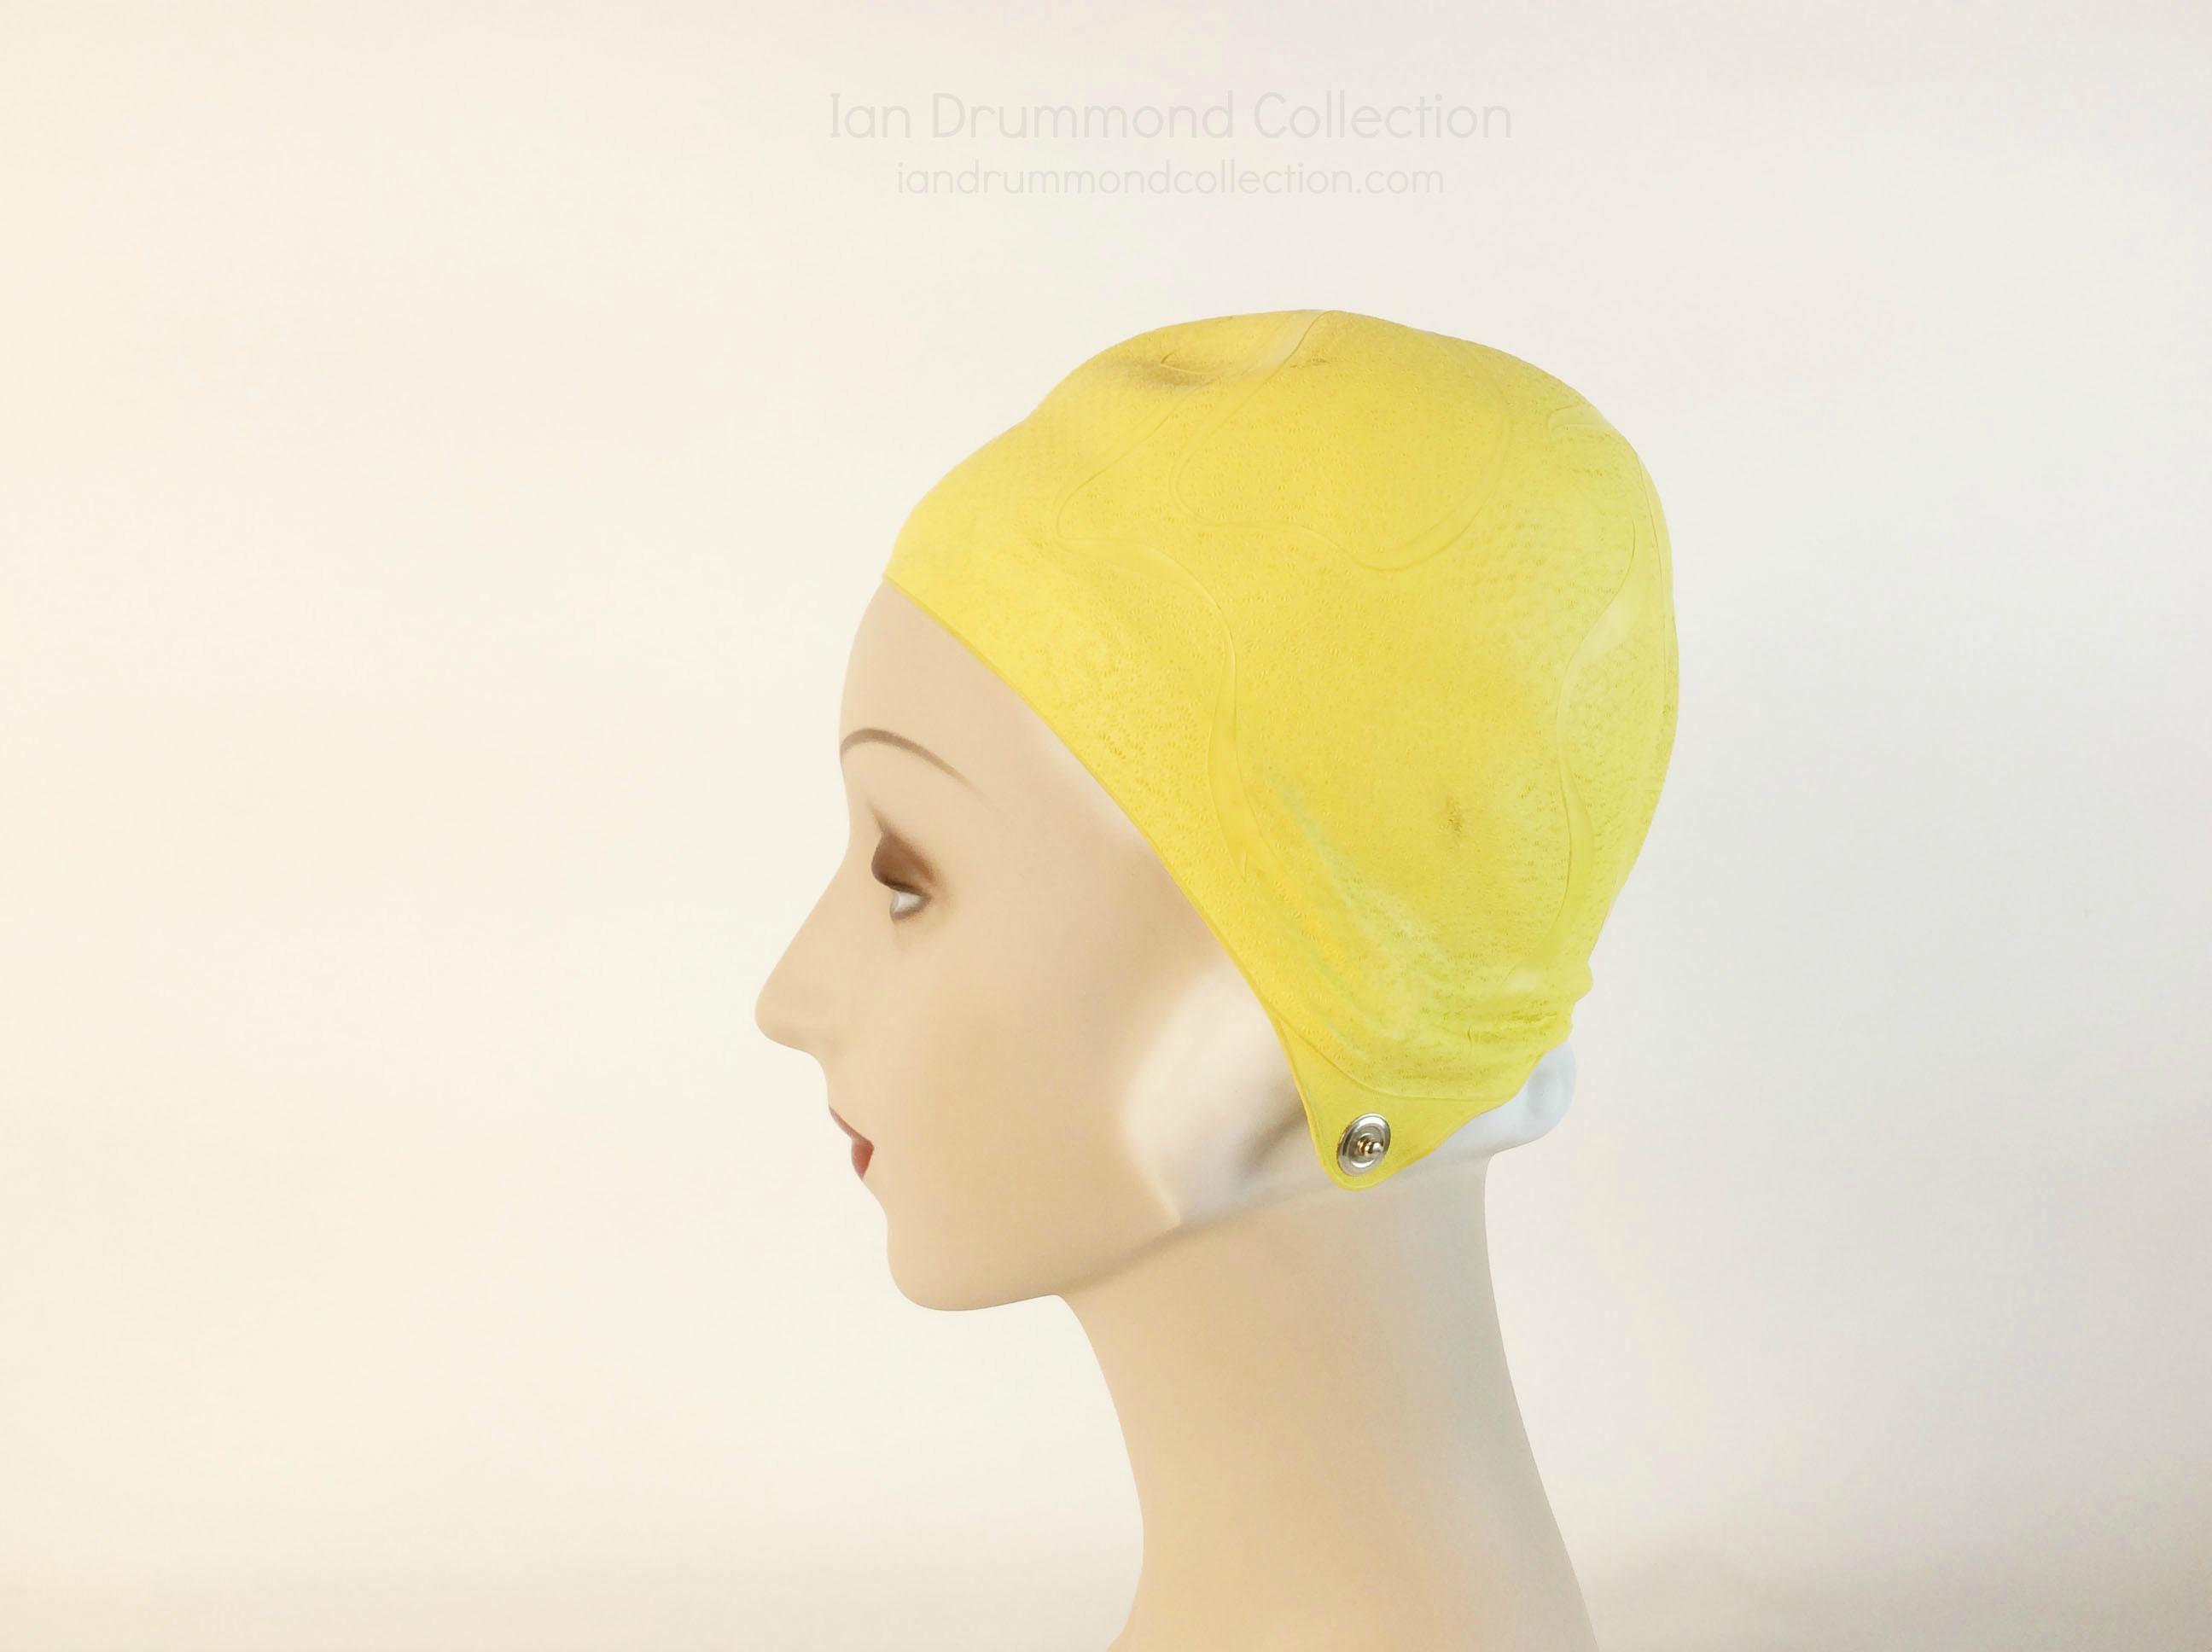 IDC Movie Wardrobe Rental Swim Cap 4 Yellow with Embossed Designs